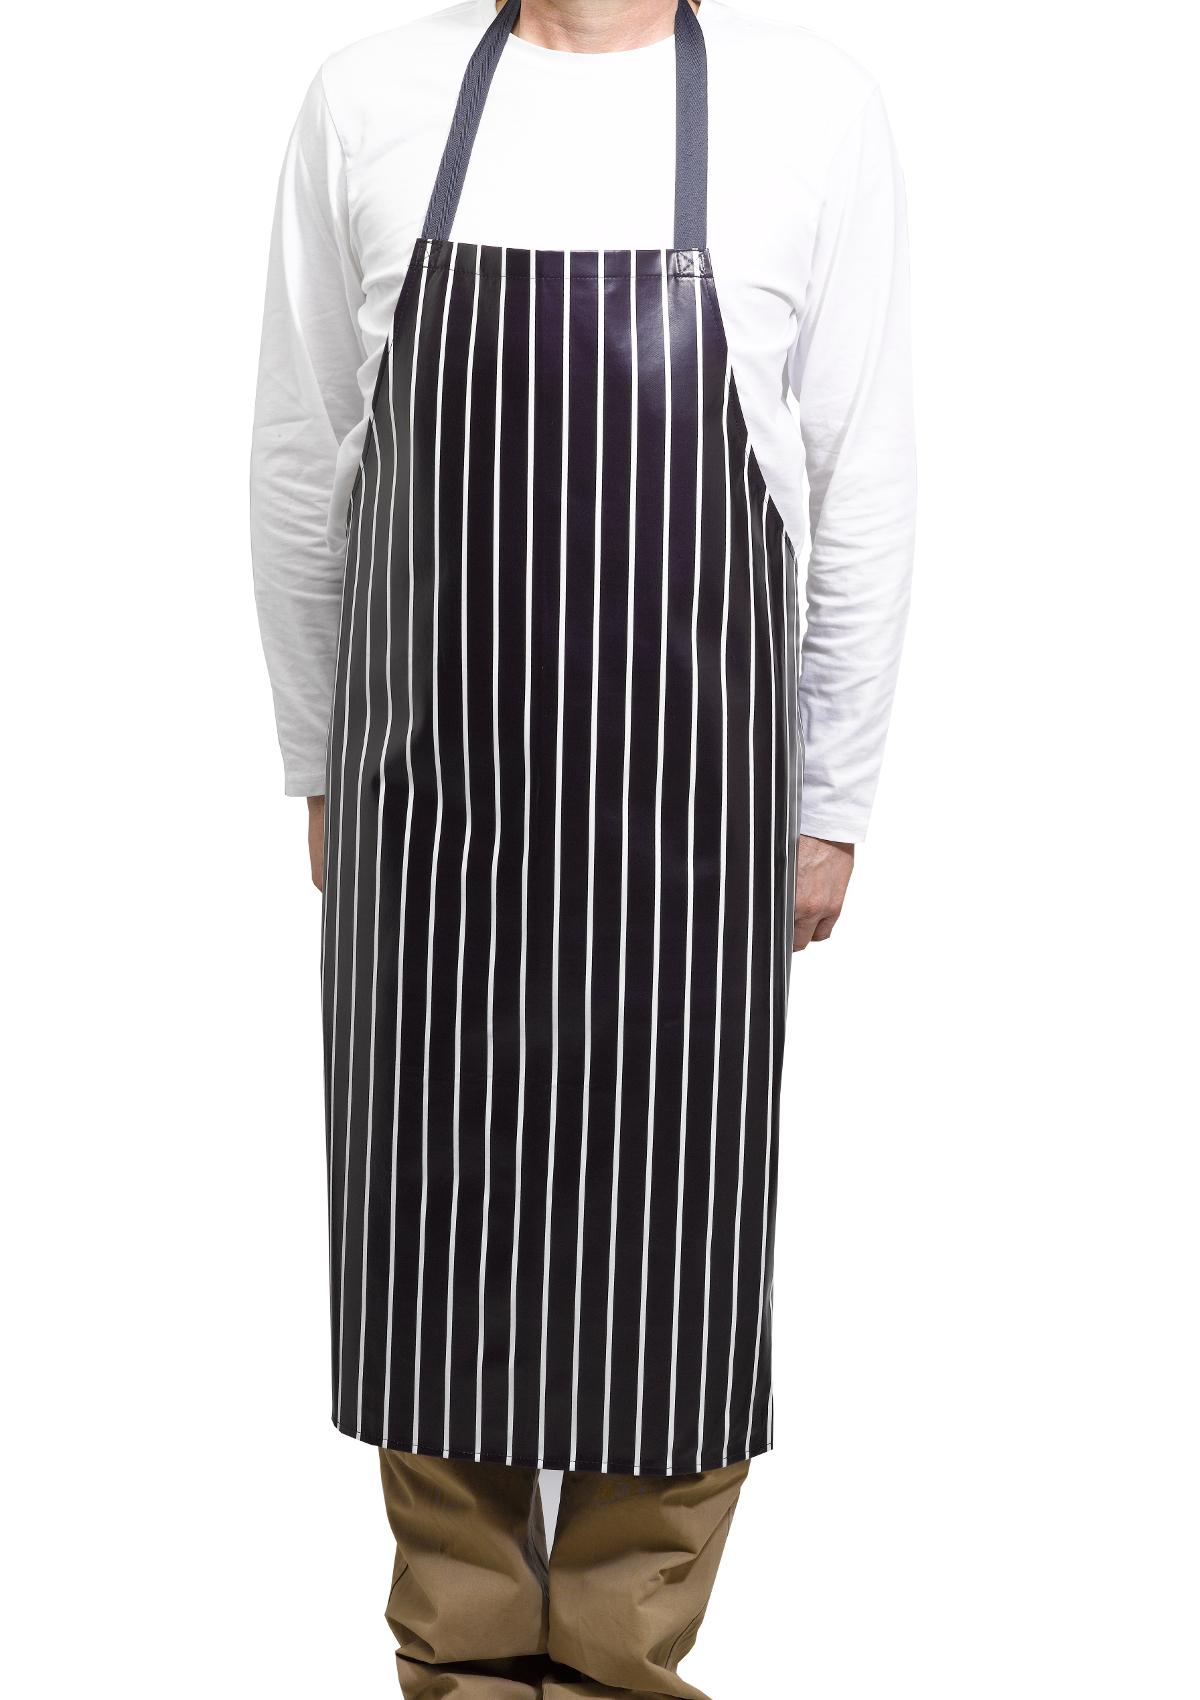 Blue and white strip chef aprons congratulate